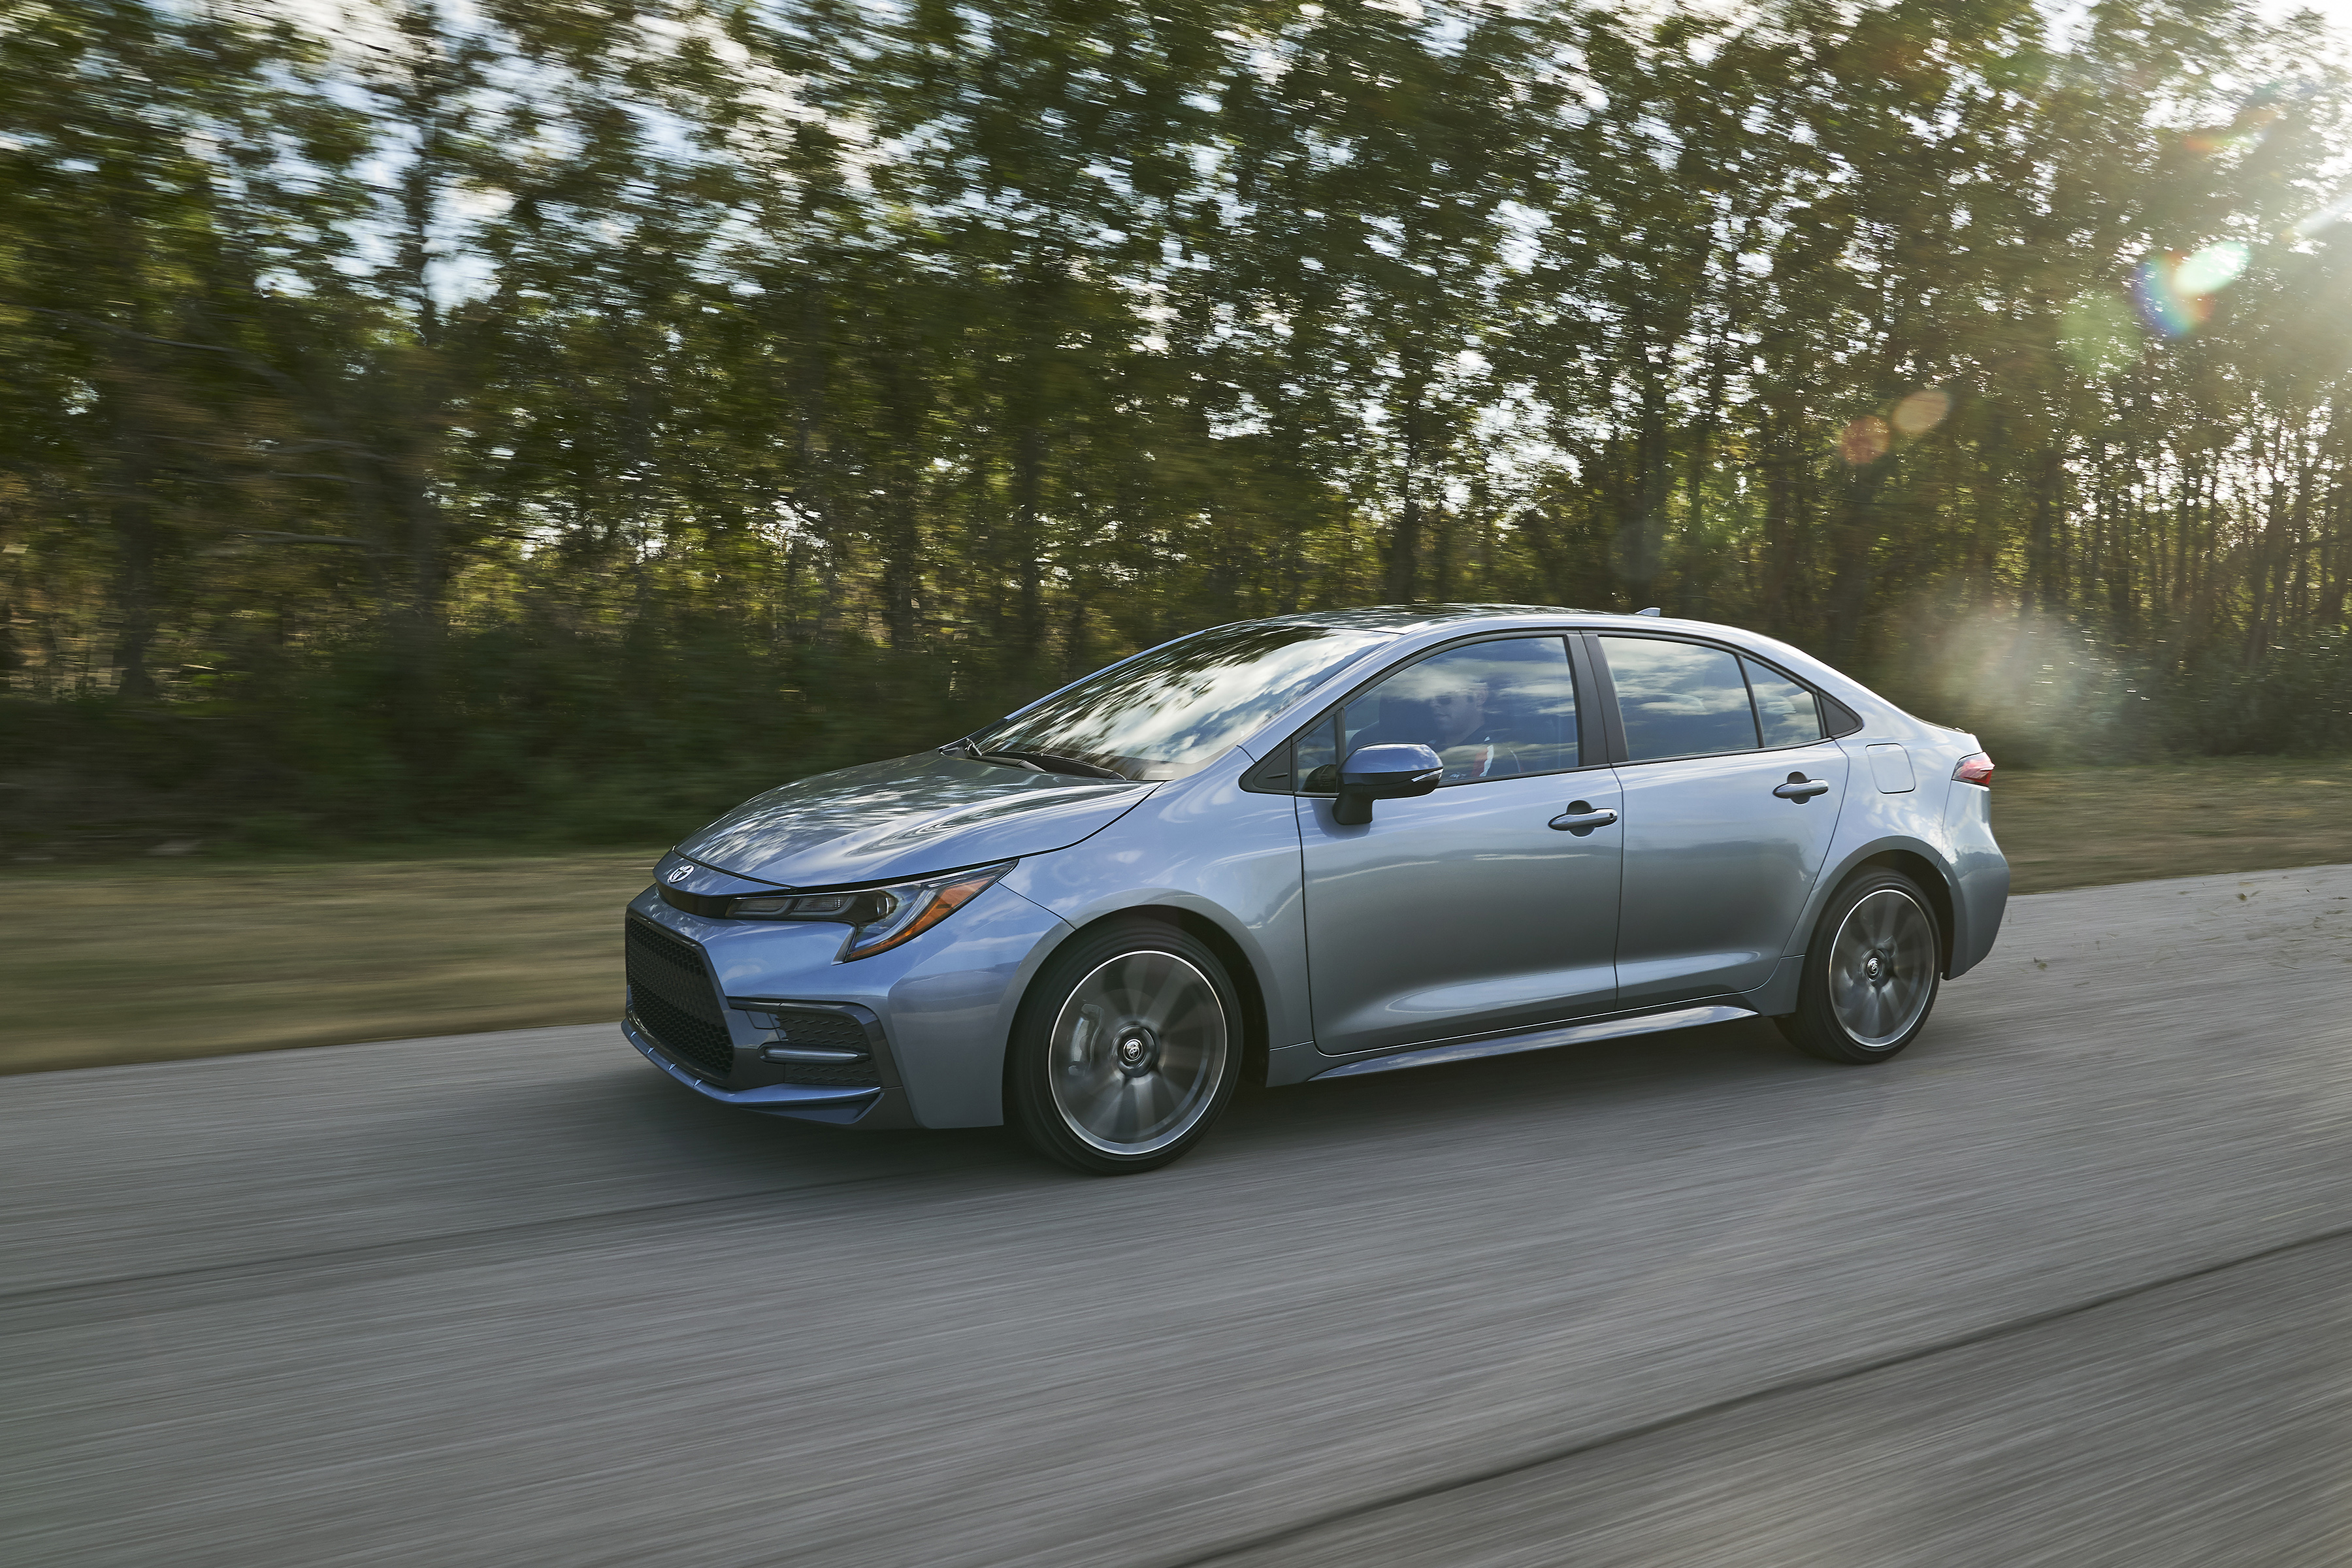 Kekurangan Toyota Corolla Sedan Top Model Tahun Ini